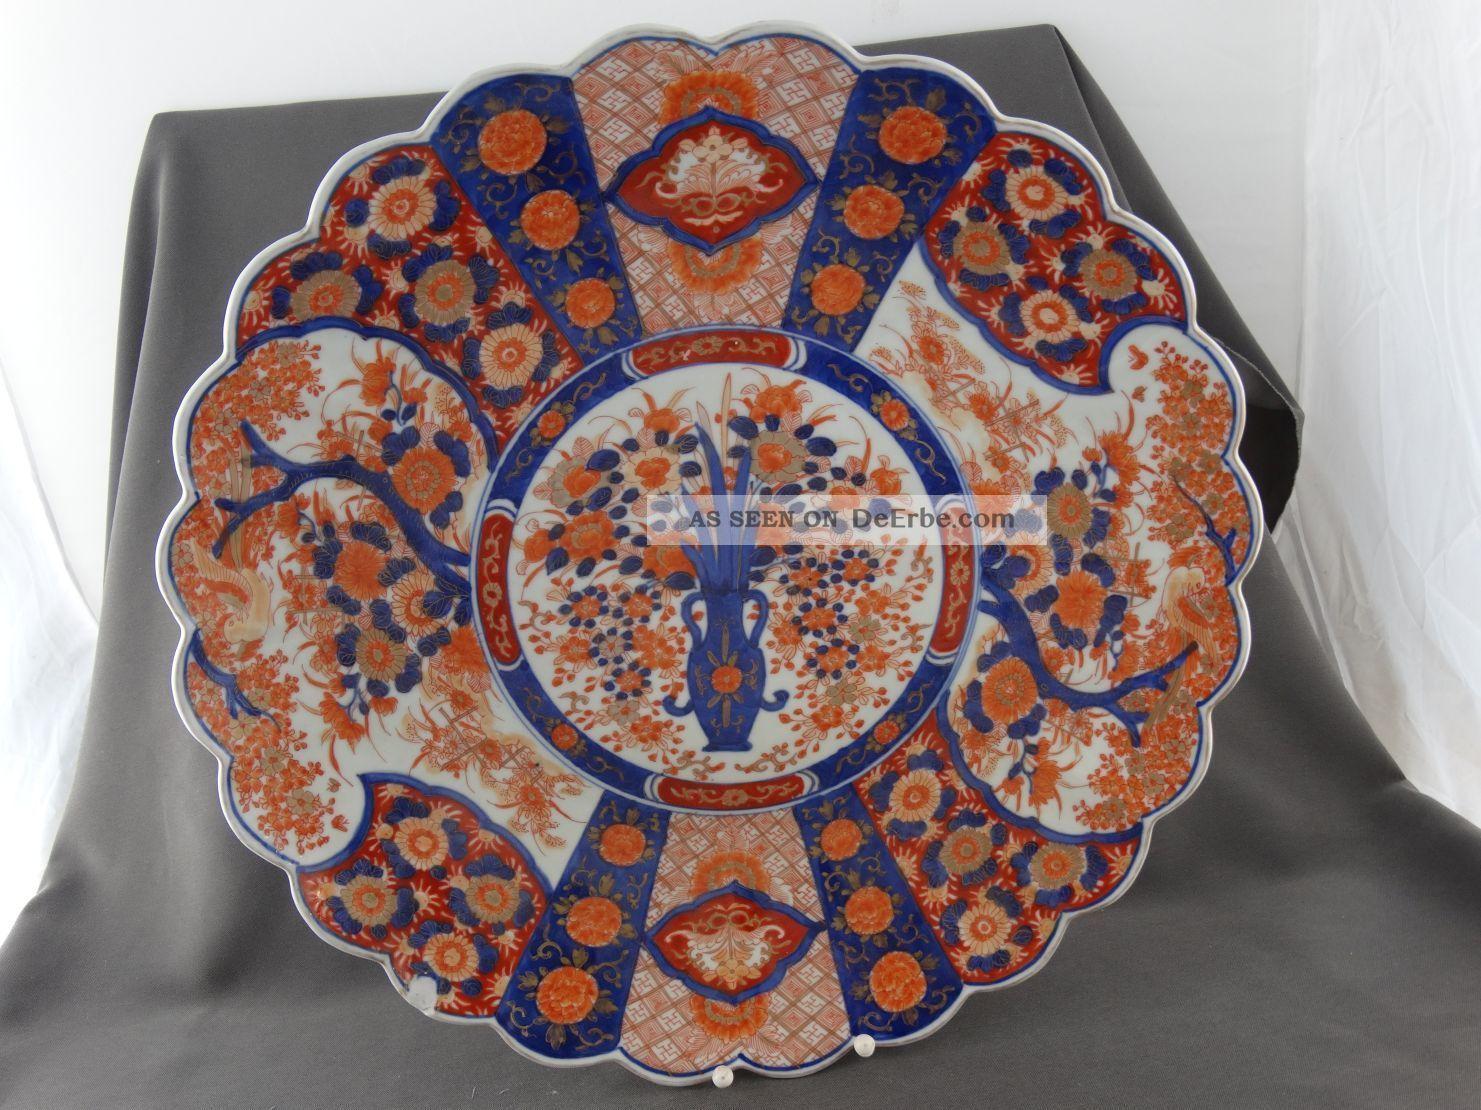 Japan Keramik Großer Alter Imari Teller Blau Rot Gold Amphore Und Blumenmalerei Asiatika: Japan Bild